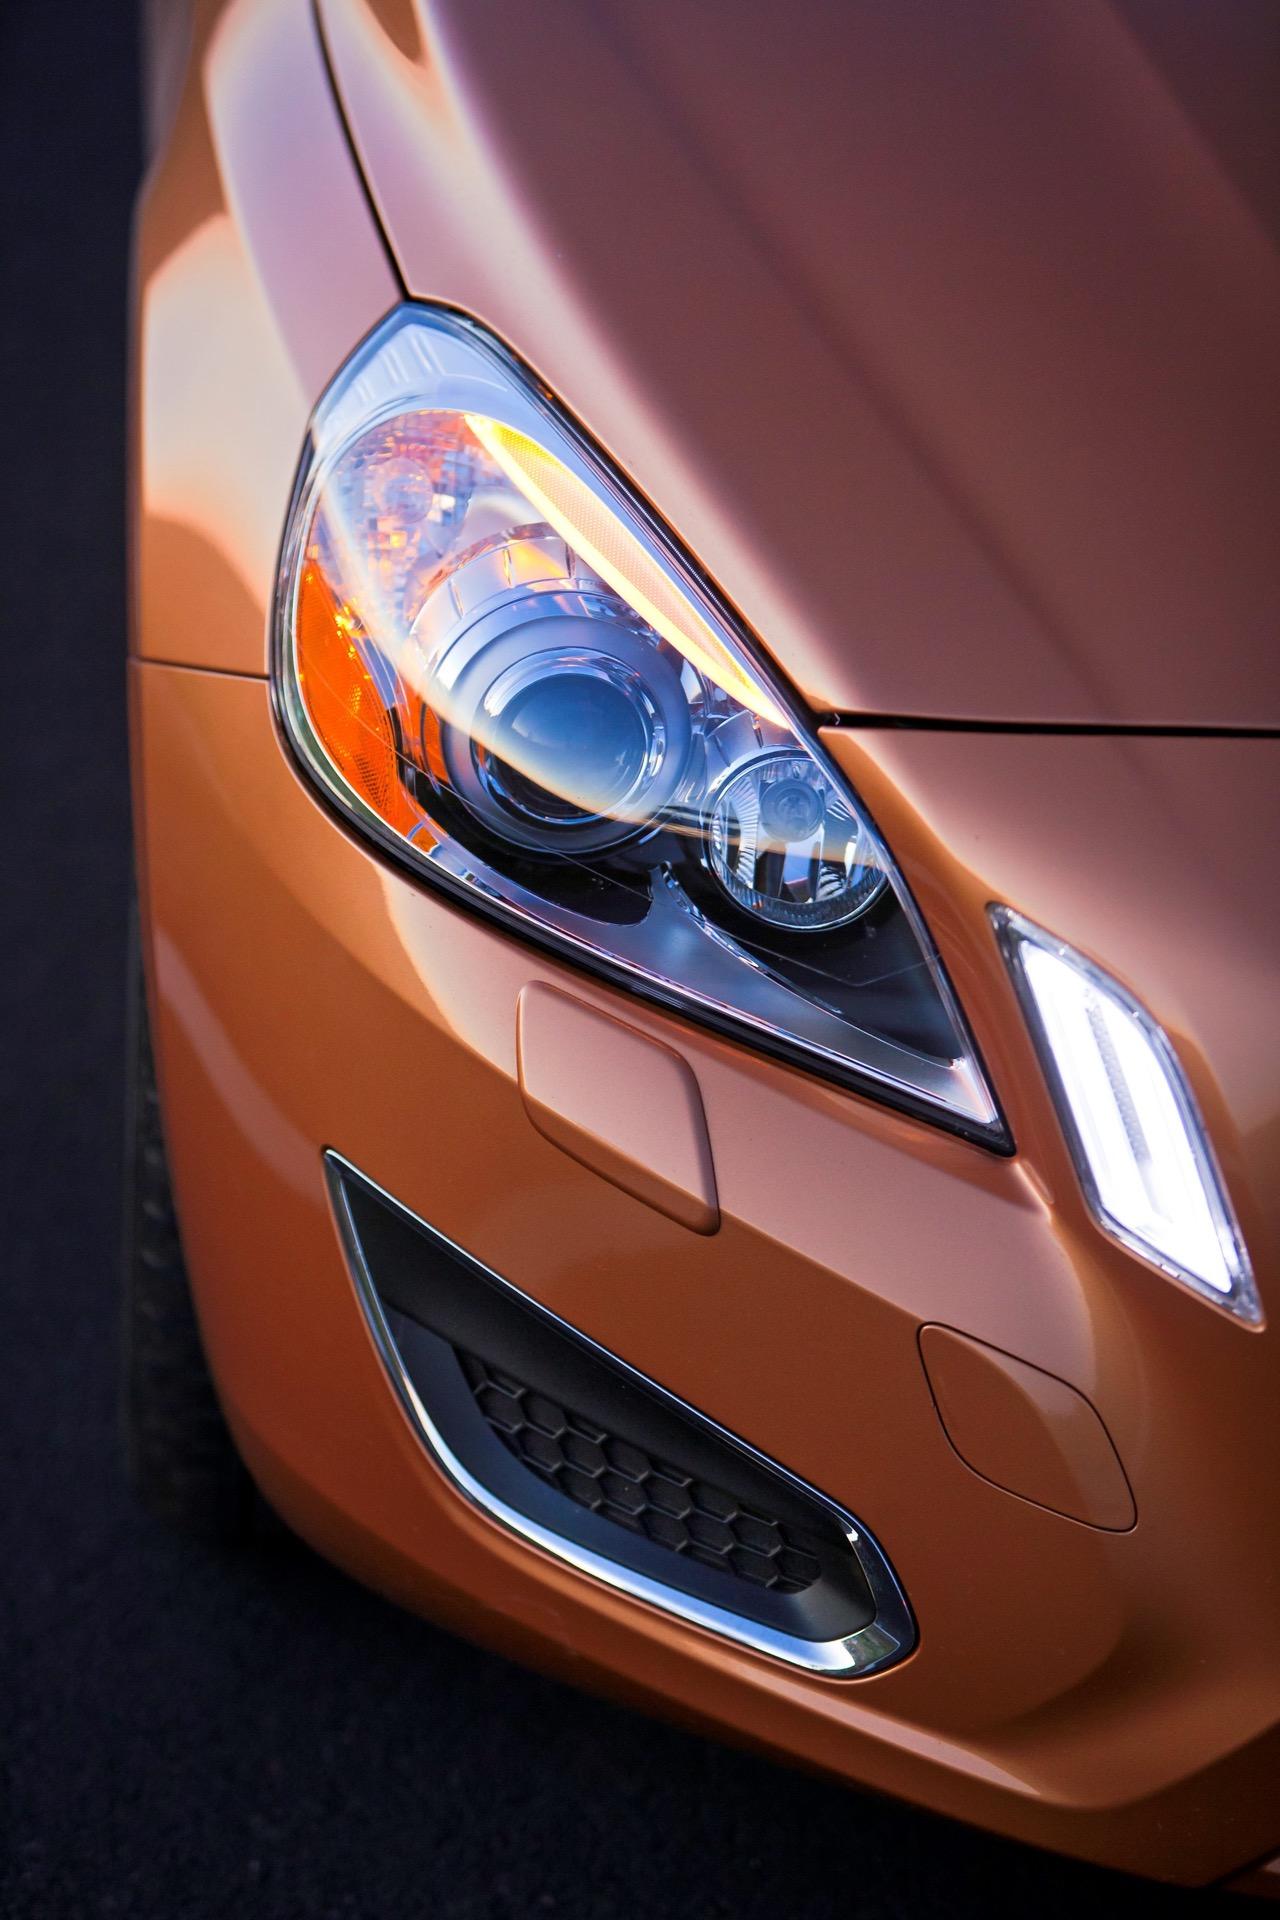 S60 T6 Awd Headlight Detail -  Volvo